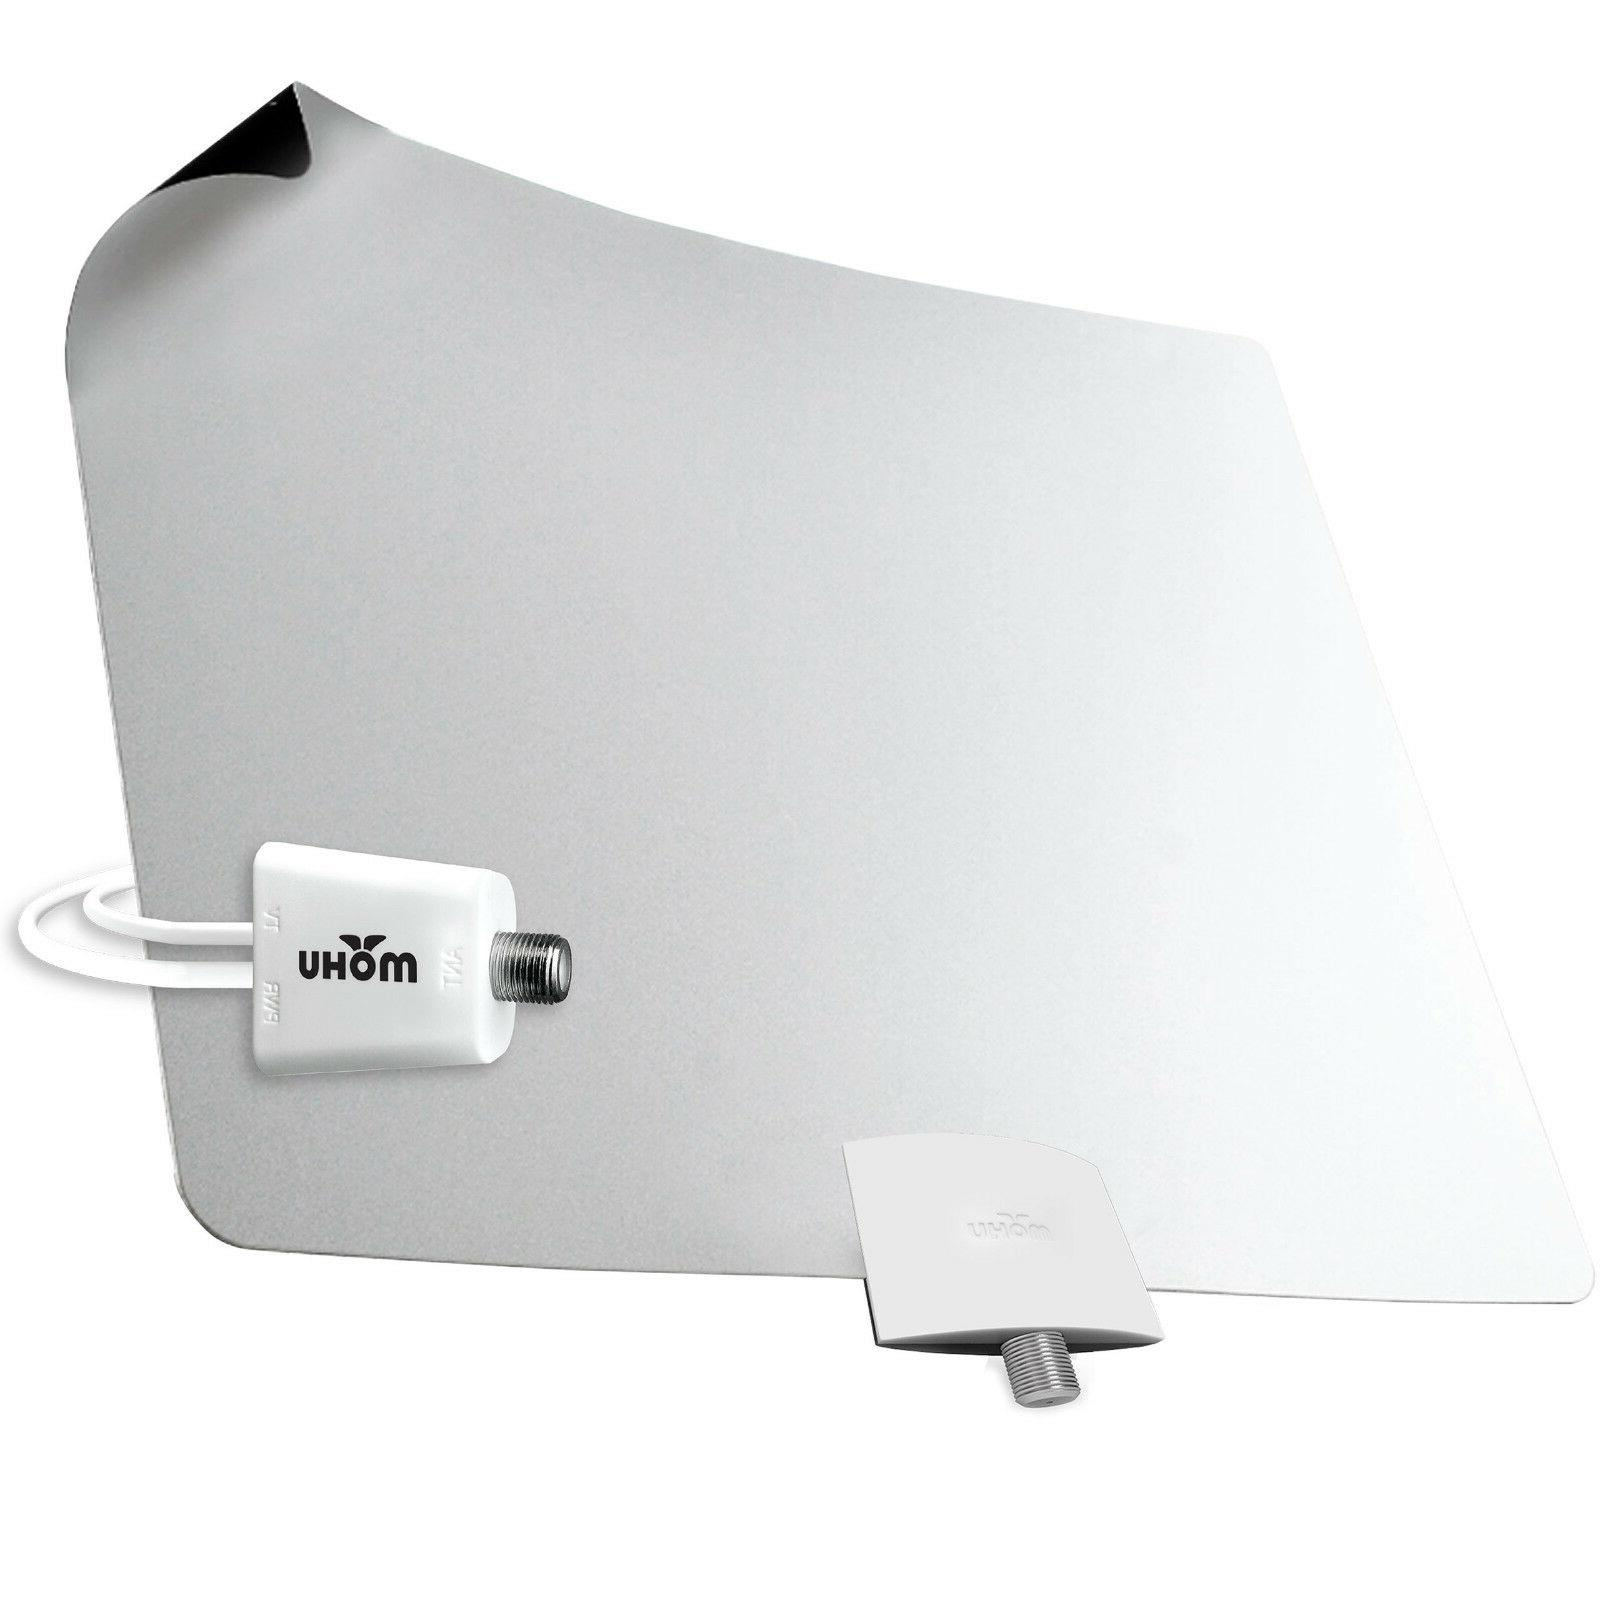 Mohu Amplified HDTV Antenna Digital